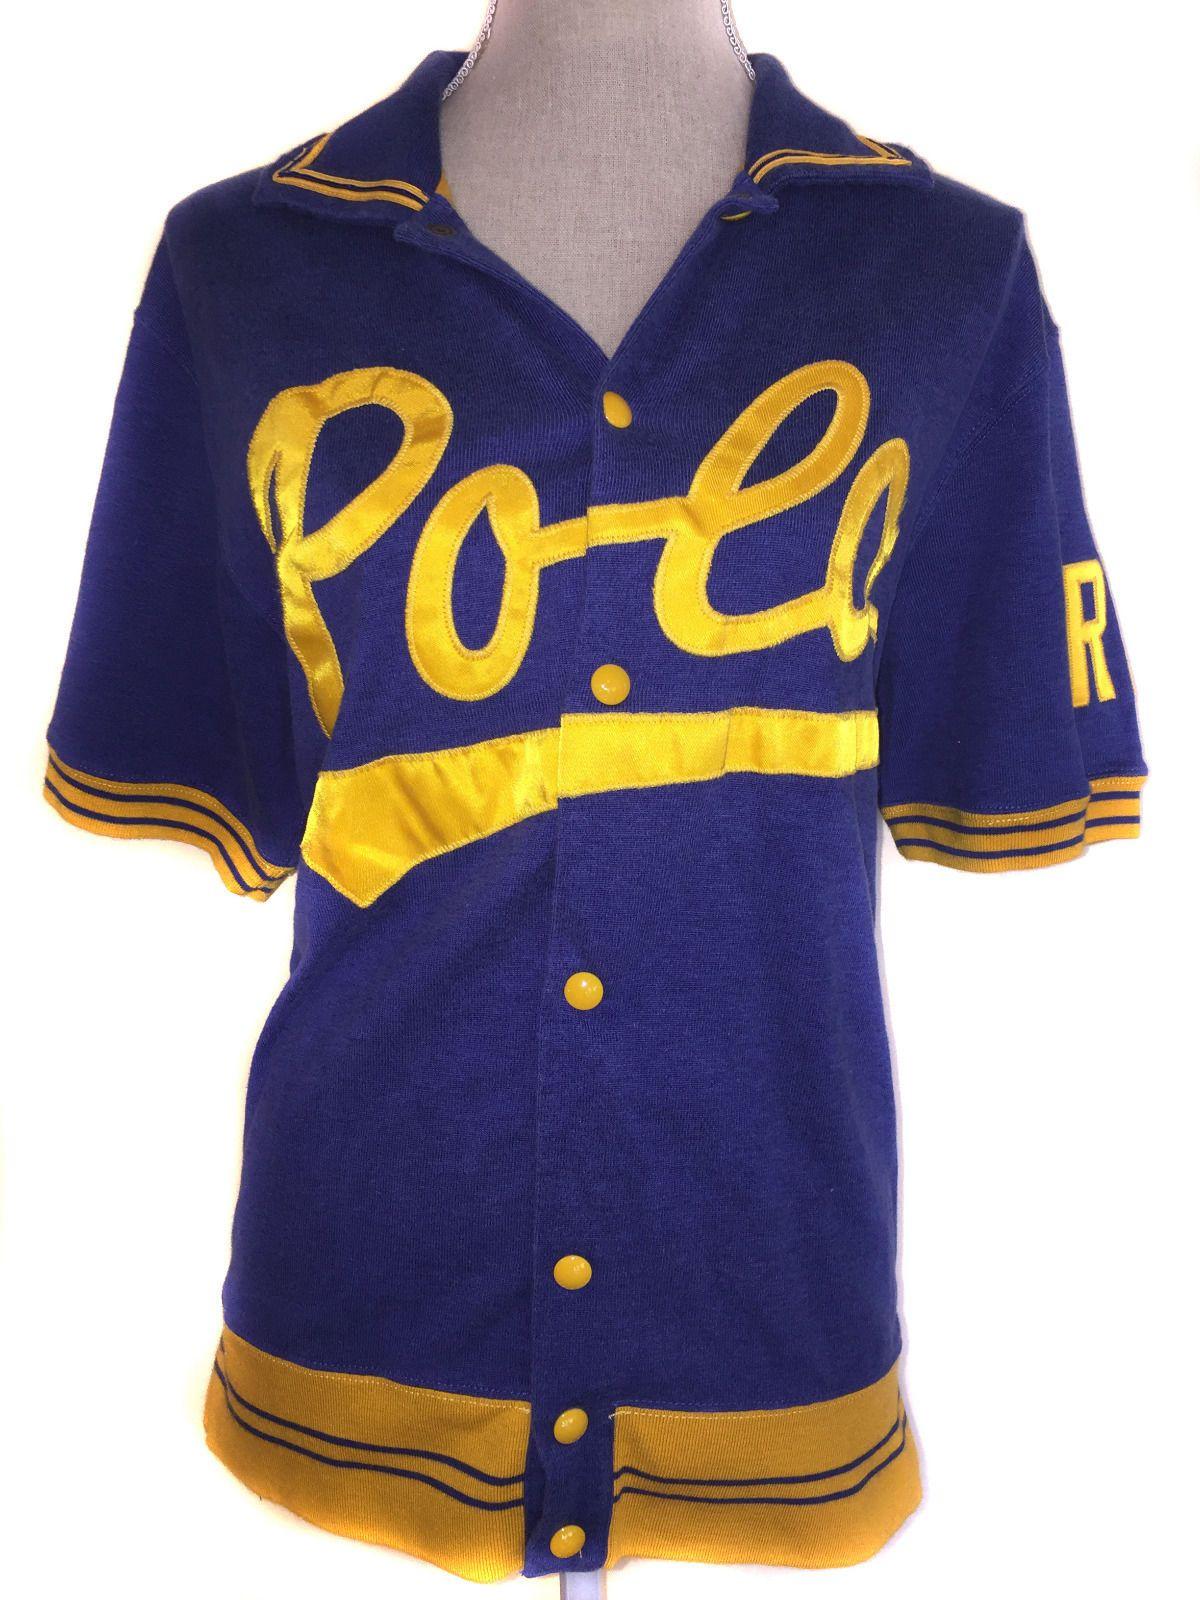 *SOLD* Vintage 1990s Polo Sport Ralph Lauren Shirt Button